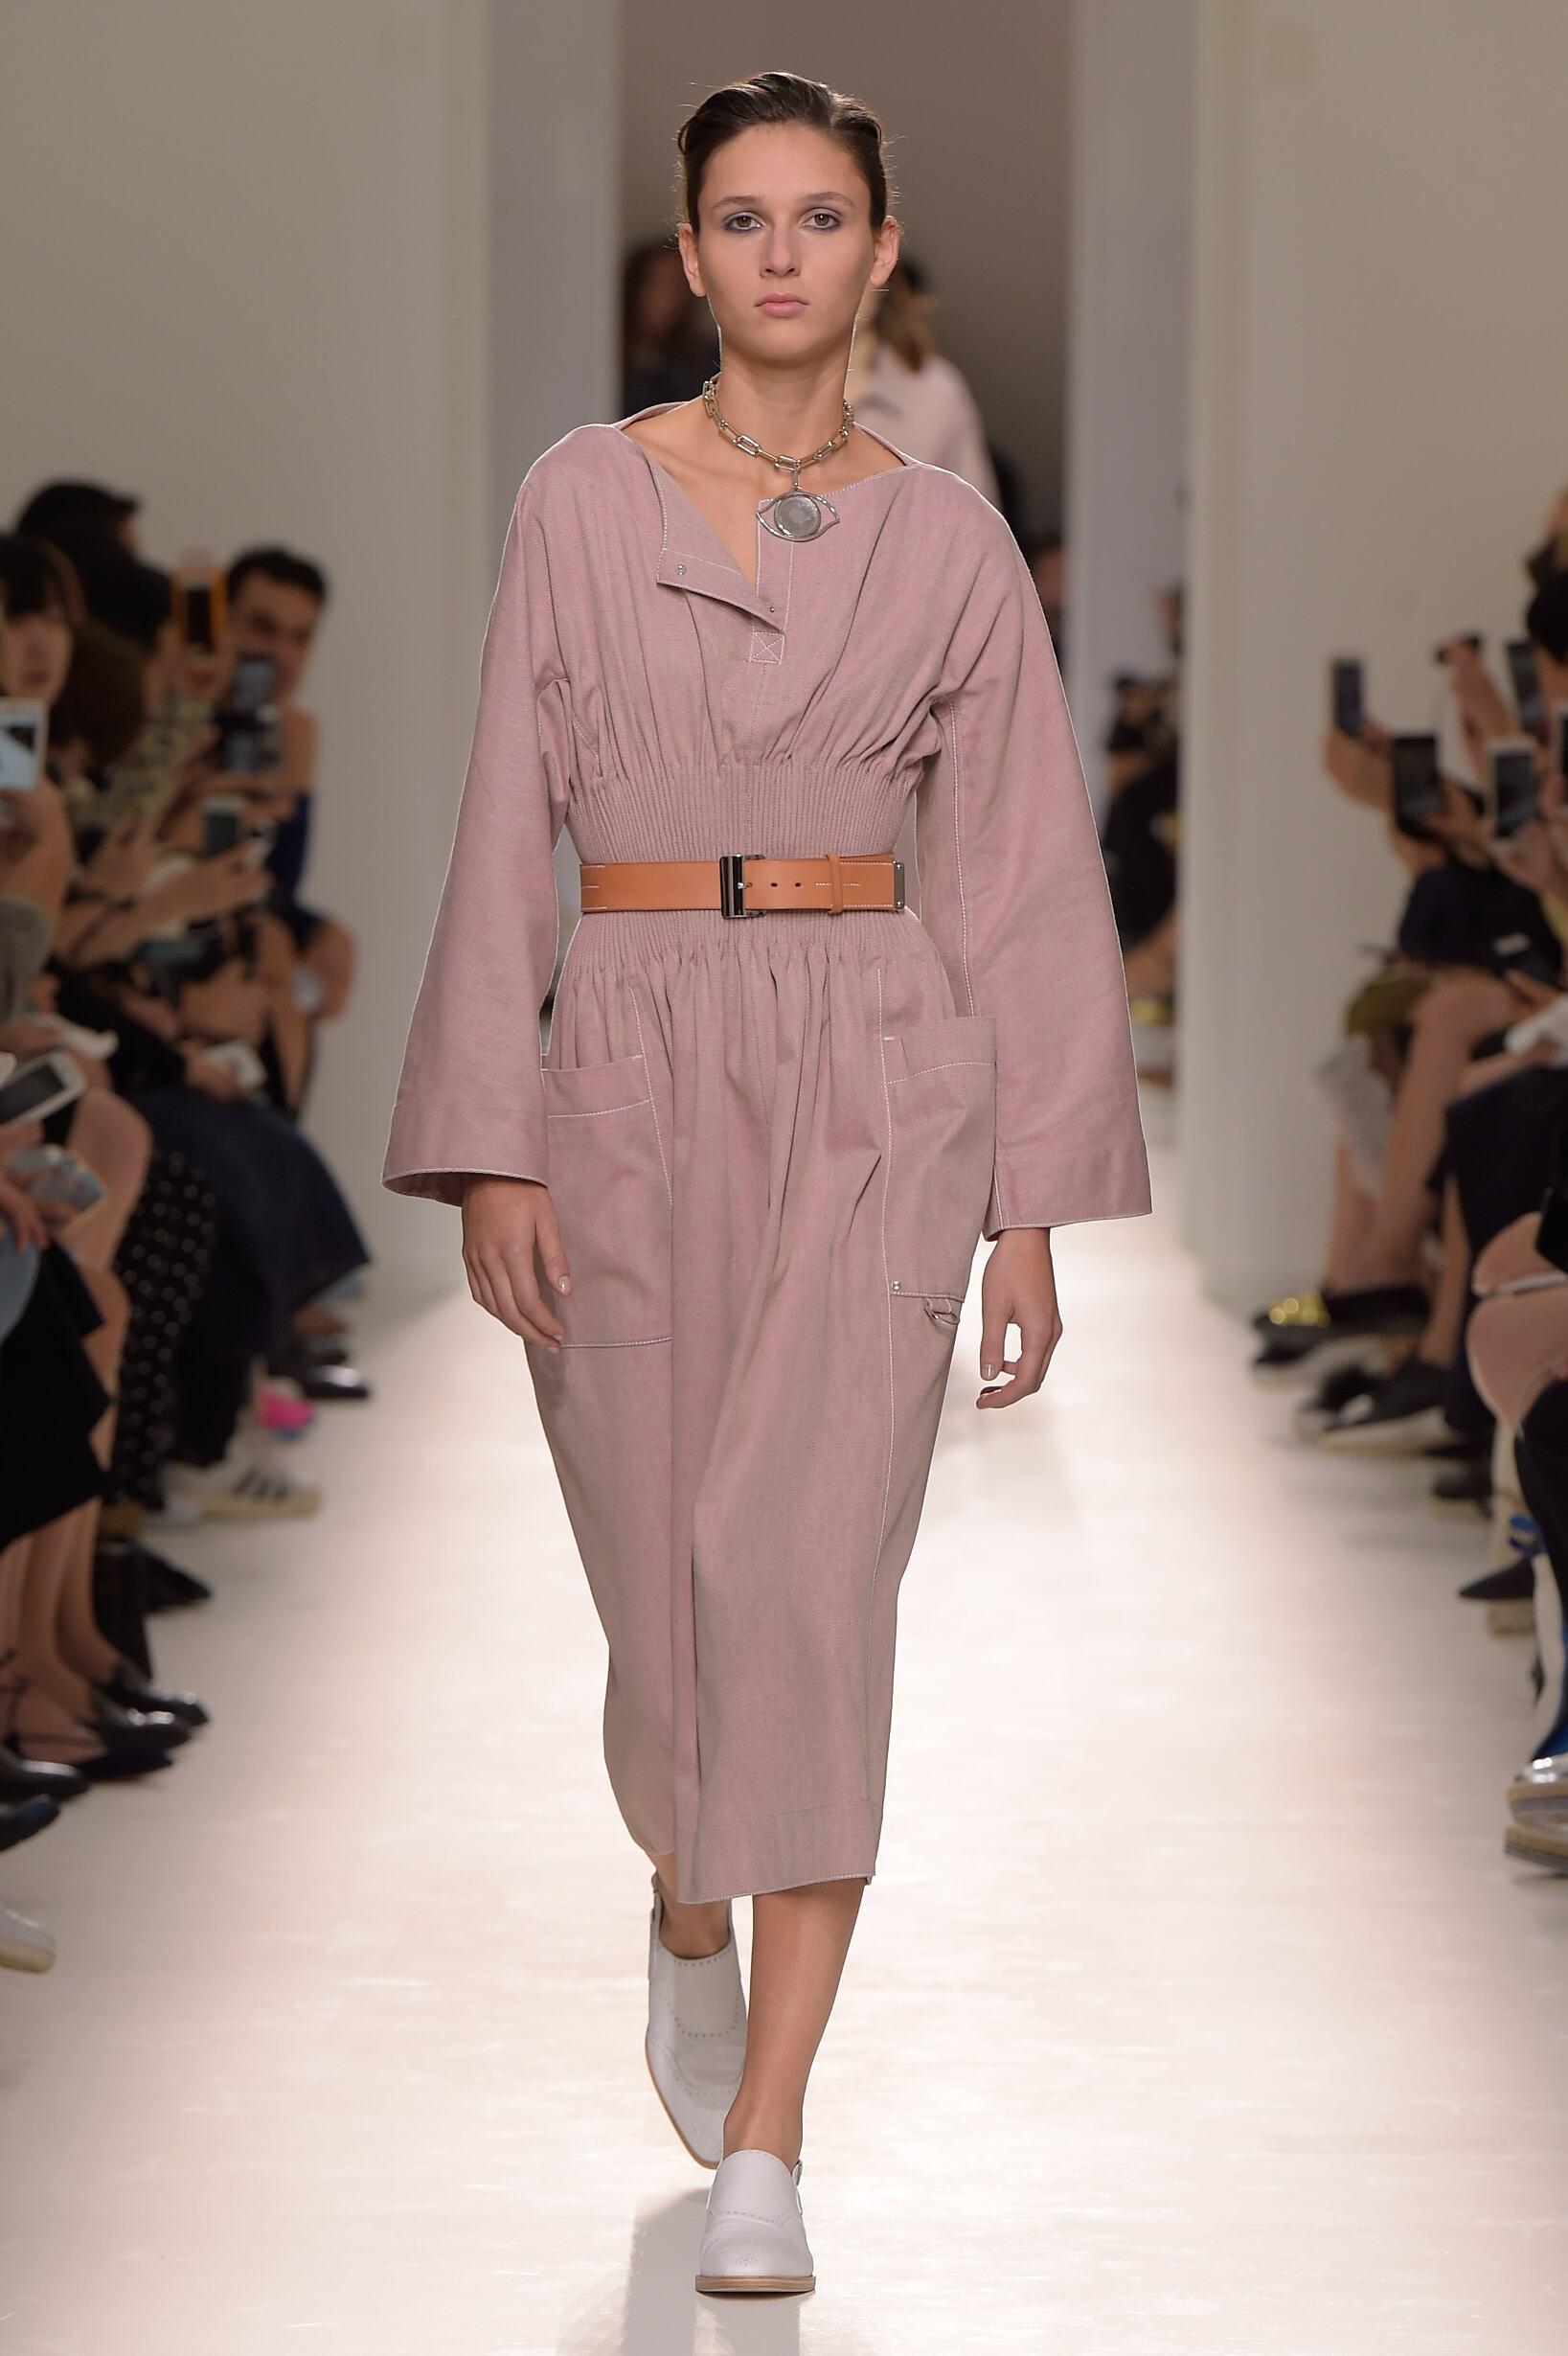 Hermès Fashion Show SS 2017